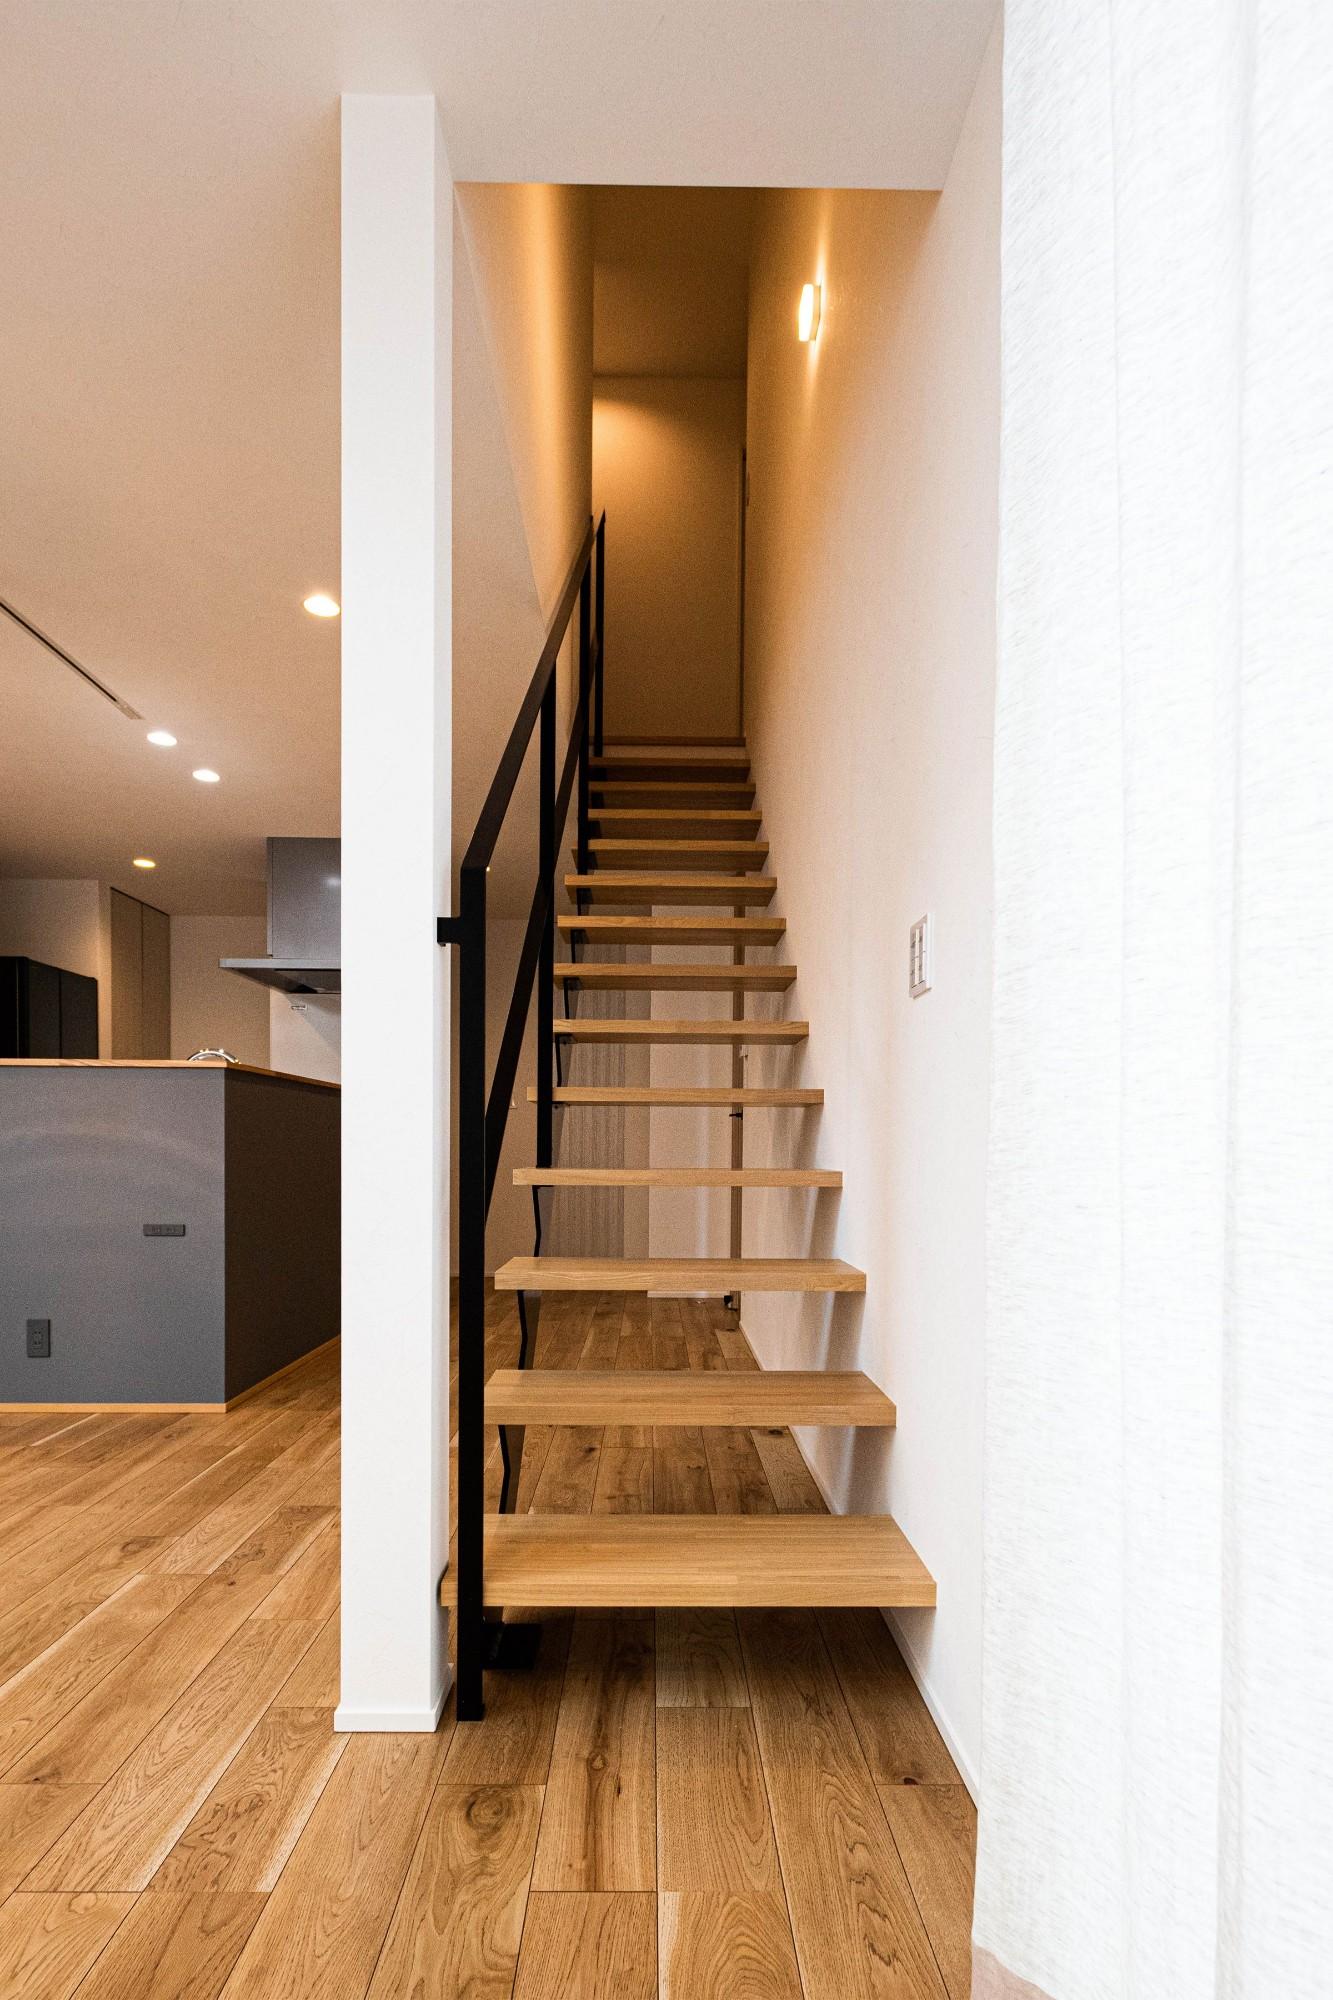 DETAIL HOME(ディテールホーム)「縦横の広がりをつくる、ツリーと吹抜けのある家」のシンプル・ナチュラルな階段の実例写真